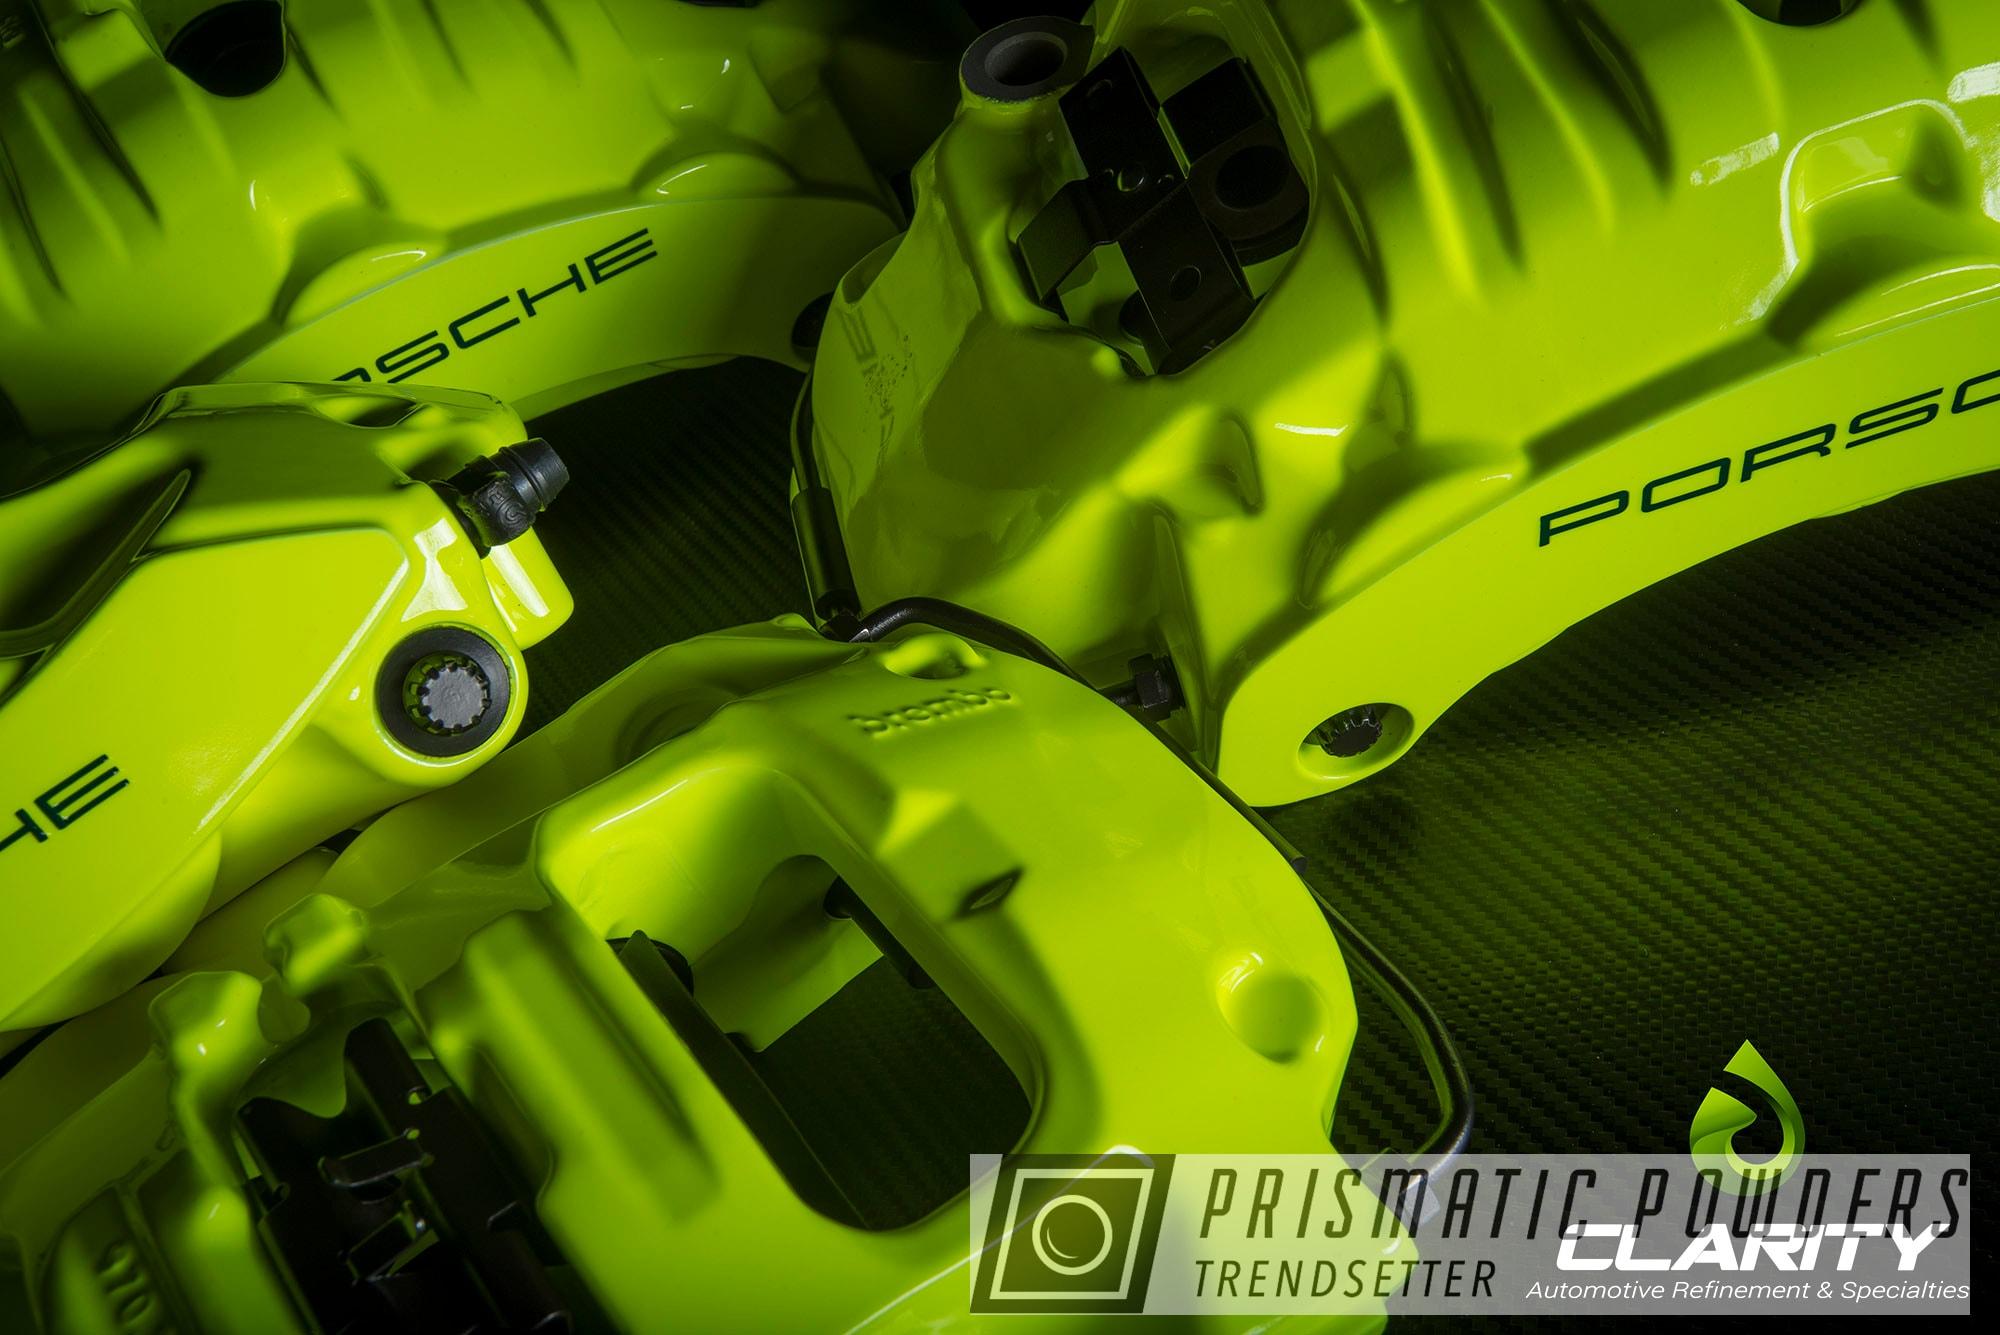 Powder Coating: Automotive,Custom Brake Caliper,Brembo,Porsche,Neon Yellow PSS-1104,Casper Clear PPS-4005,Brembo Brakes,Brembo Brake Calipers,Custom Brake Calipers,Powder Coated Brembo Brakes